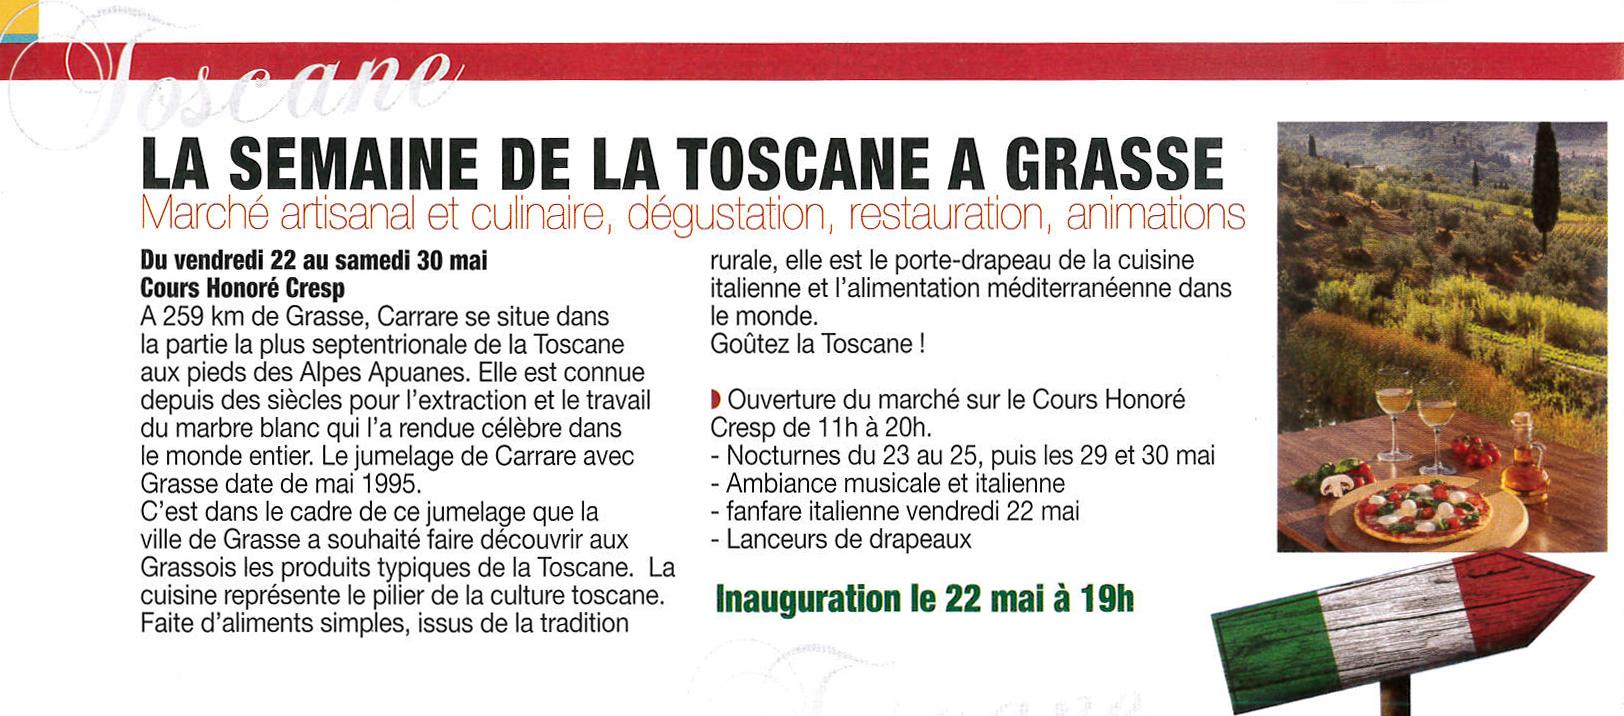 Grasse : Semaine de la Toscane…